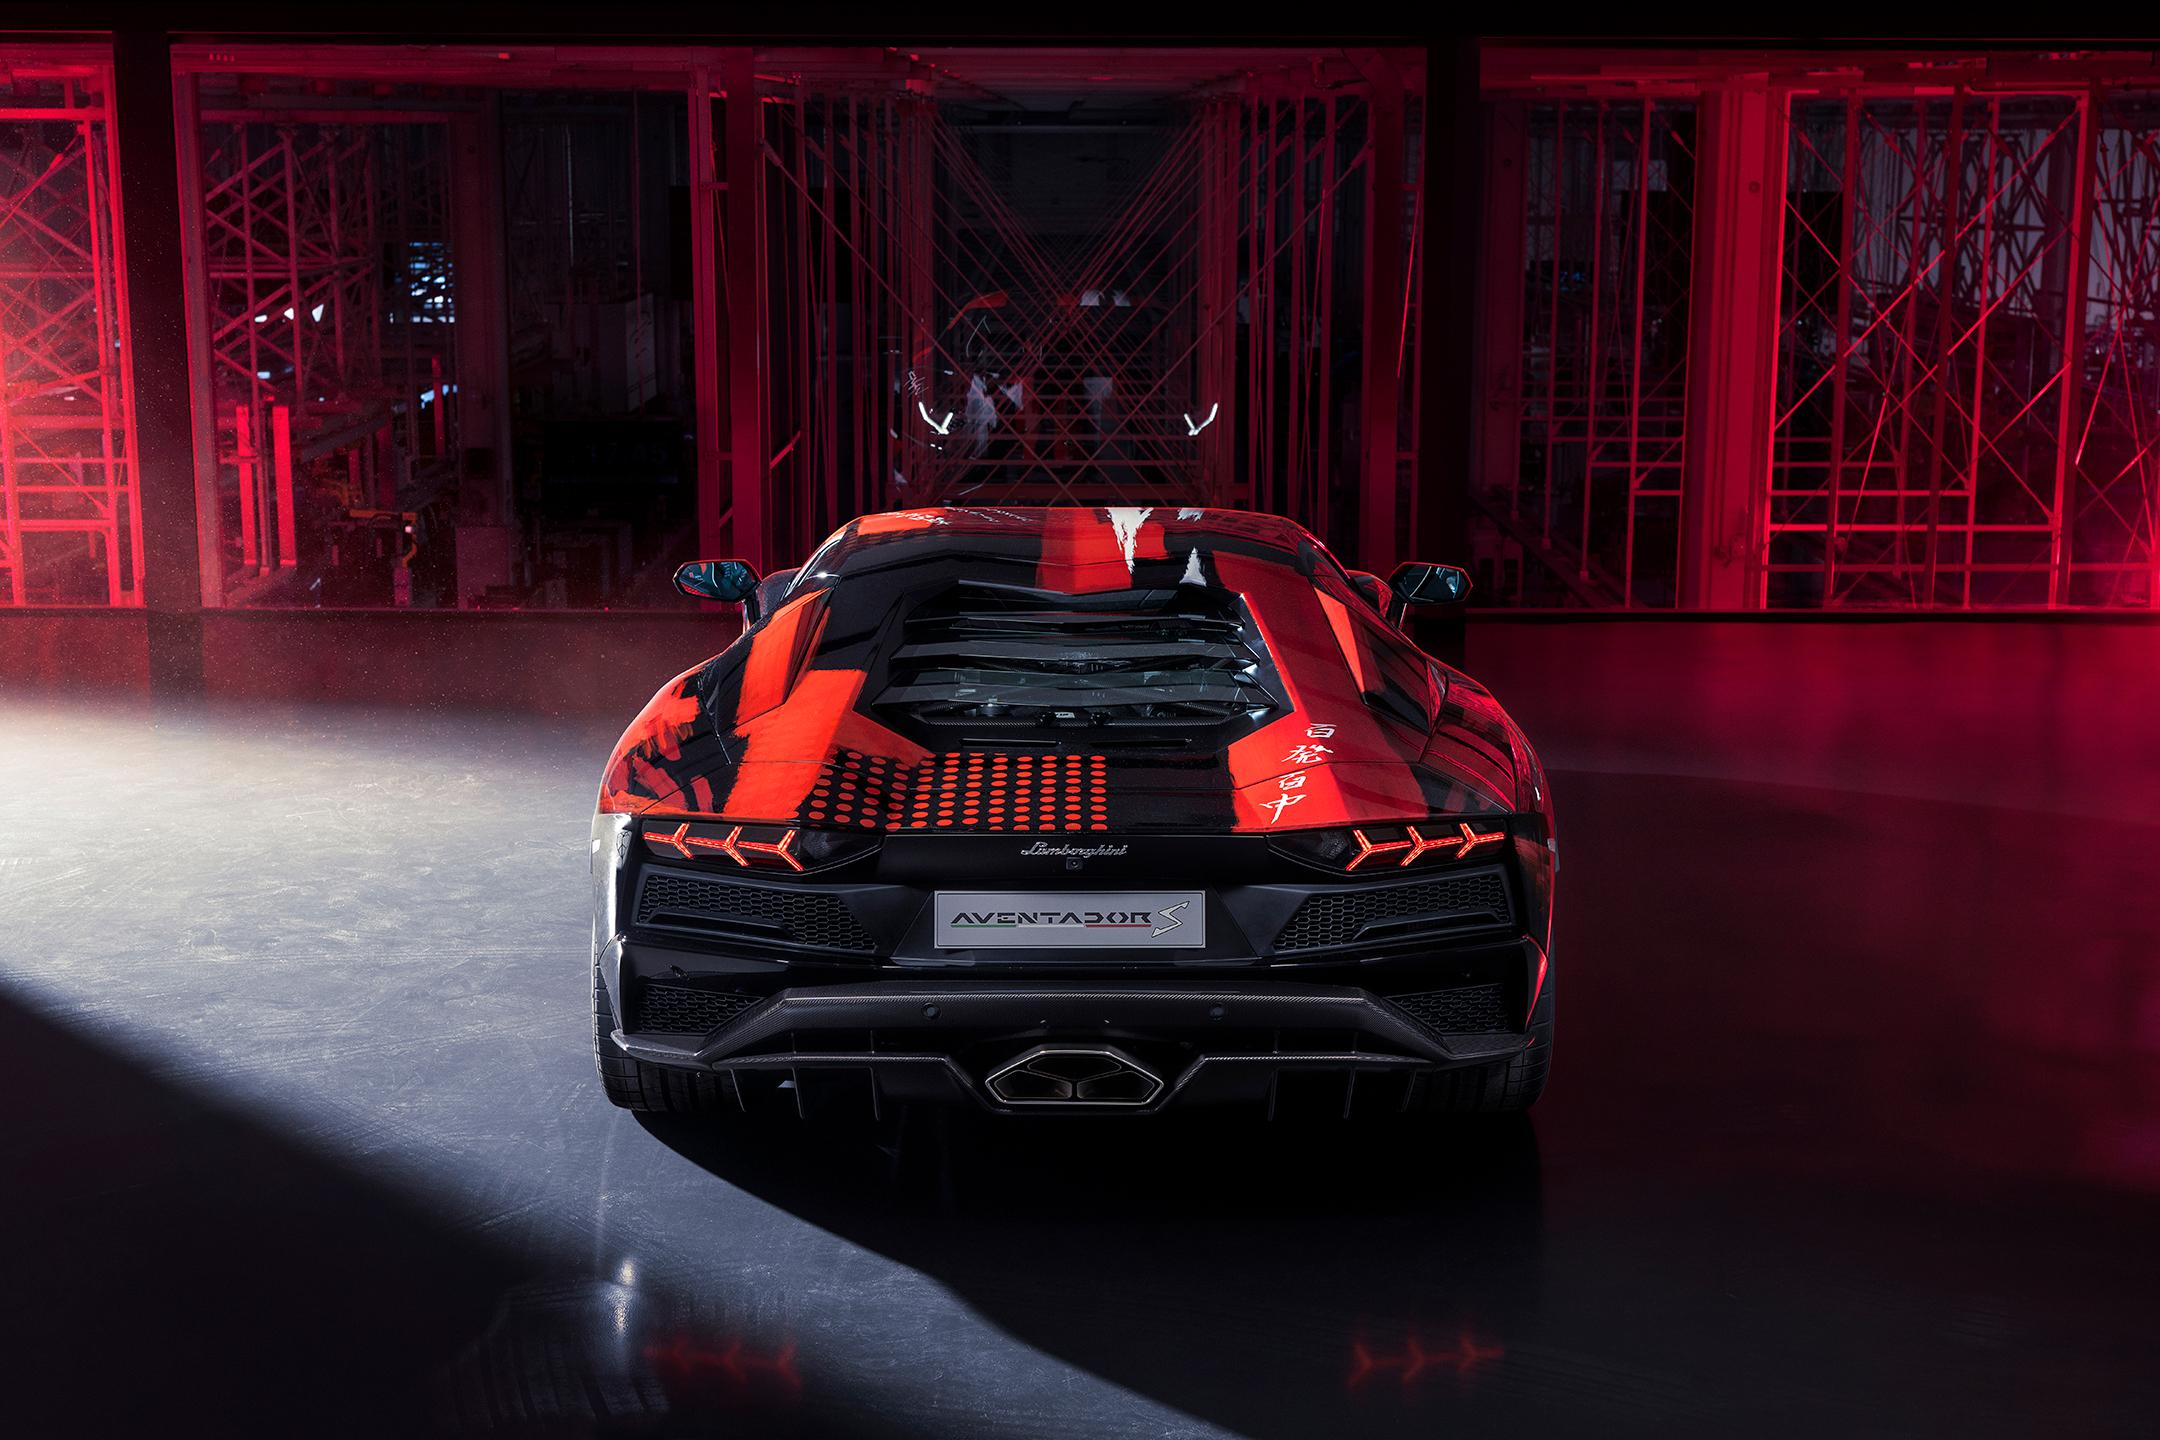 Lamborghini Aventador S x Yohji Yamamoto fashion designer - 2020 - rear-face / face arrière